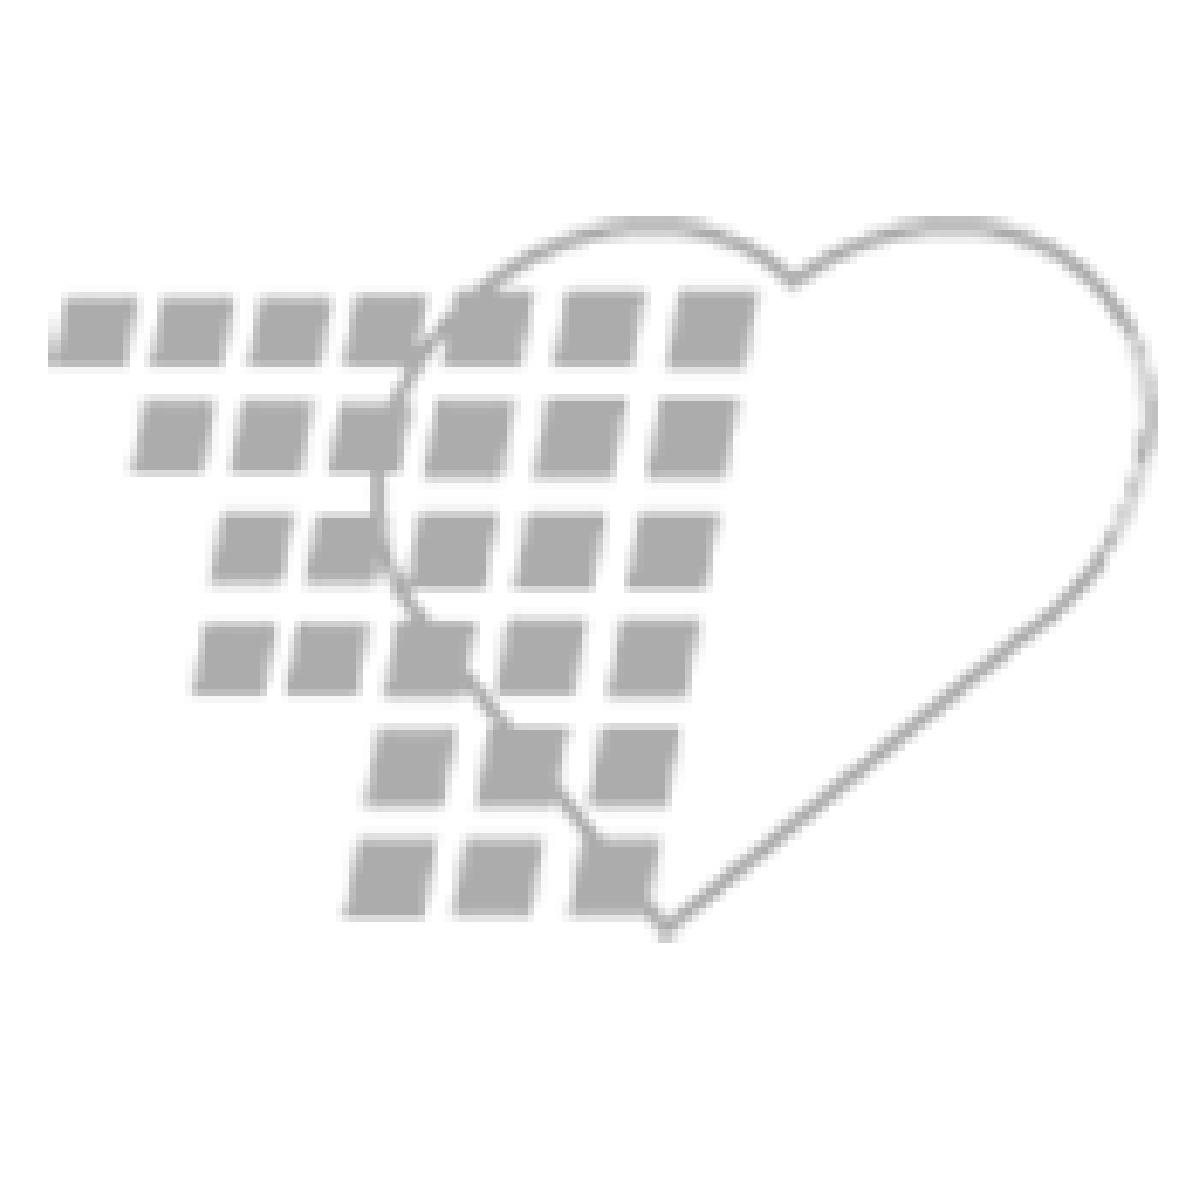 06-93-1504 Demo Dose® Simulated Levalbuterol HCL 1.25mg/3 mL